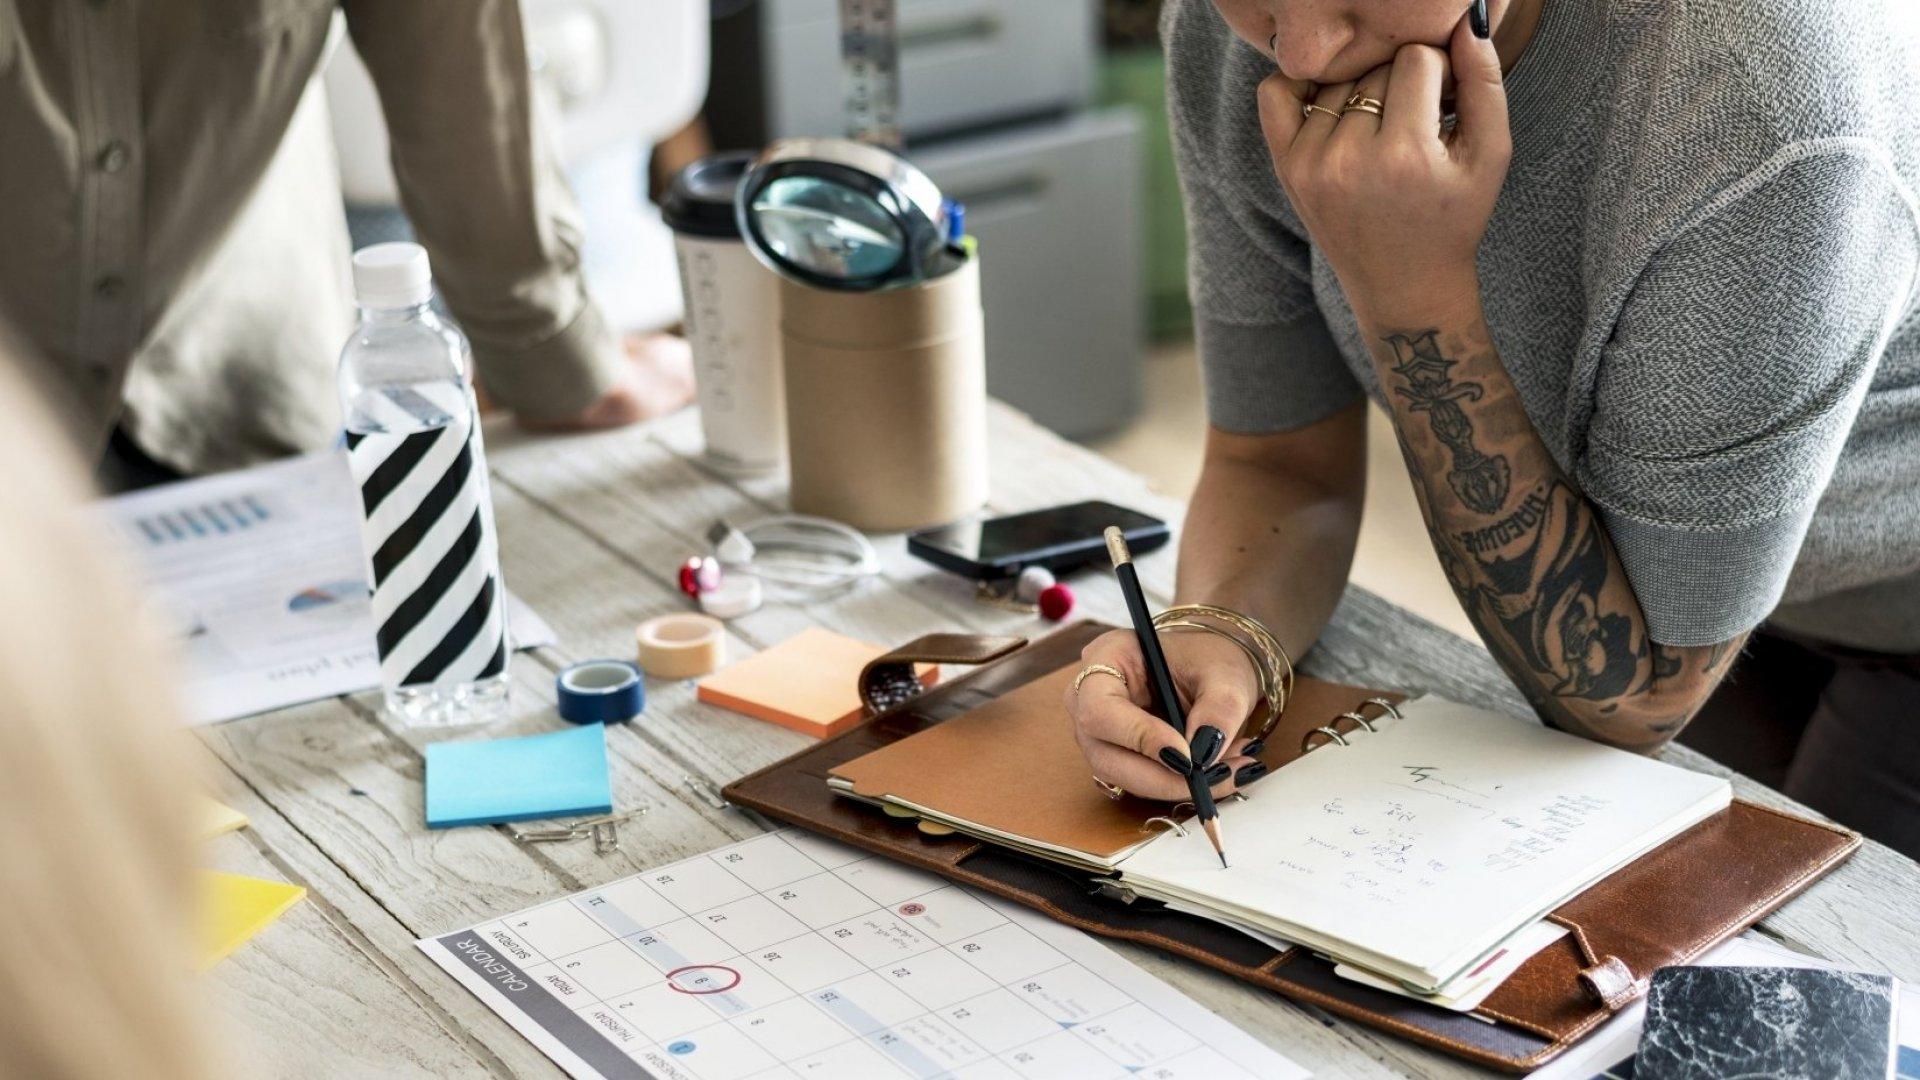 Make Your To-Do Lists Smarter